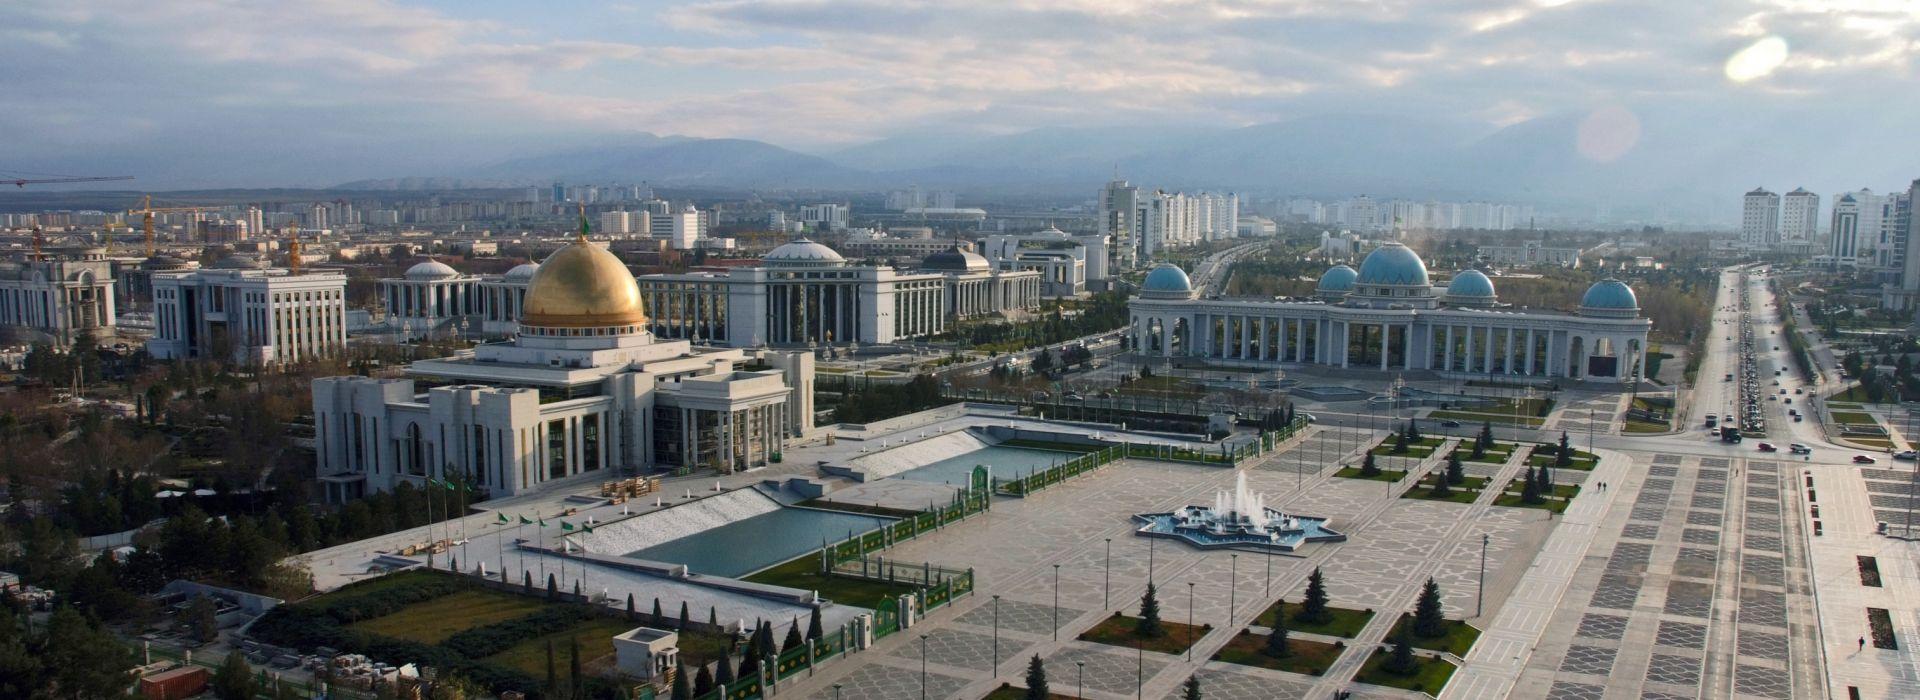 Travelling Turkmenistan - Tours and Trips in Turkmenistan